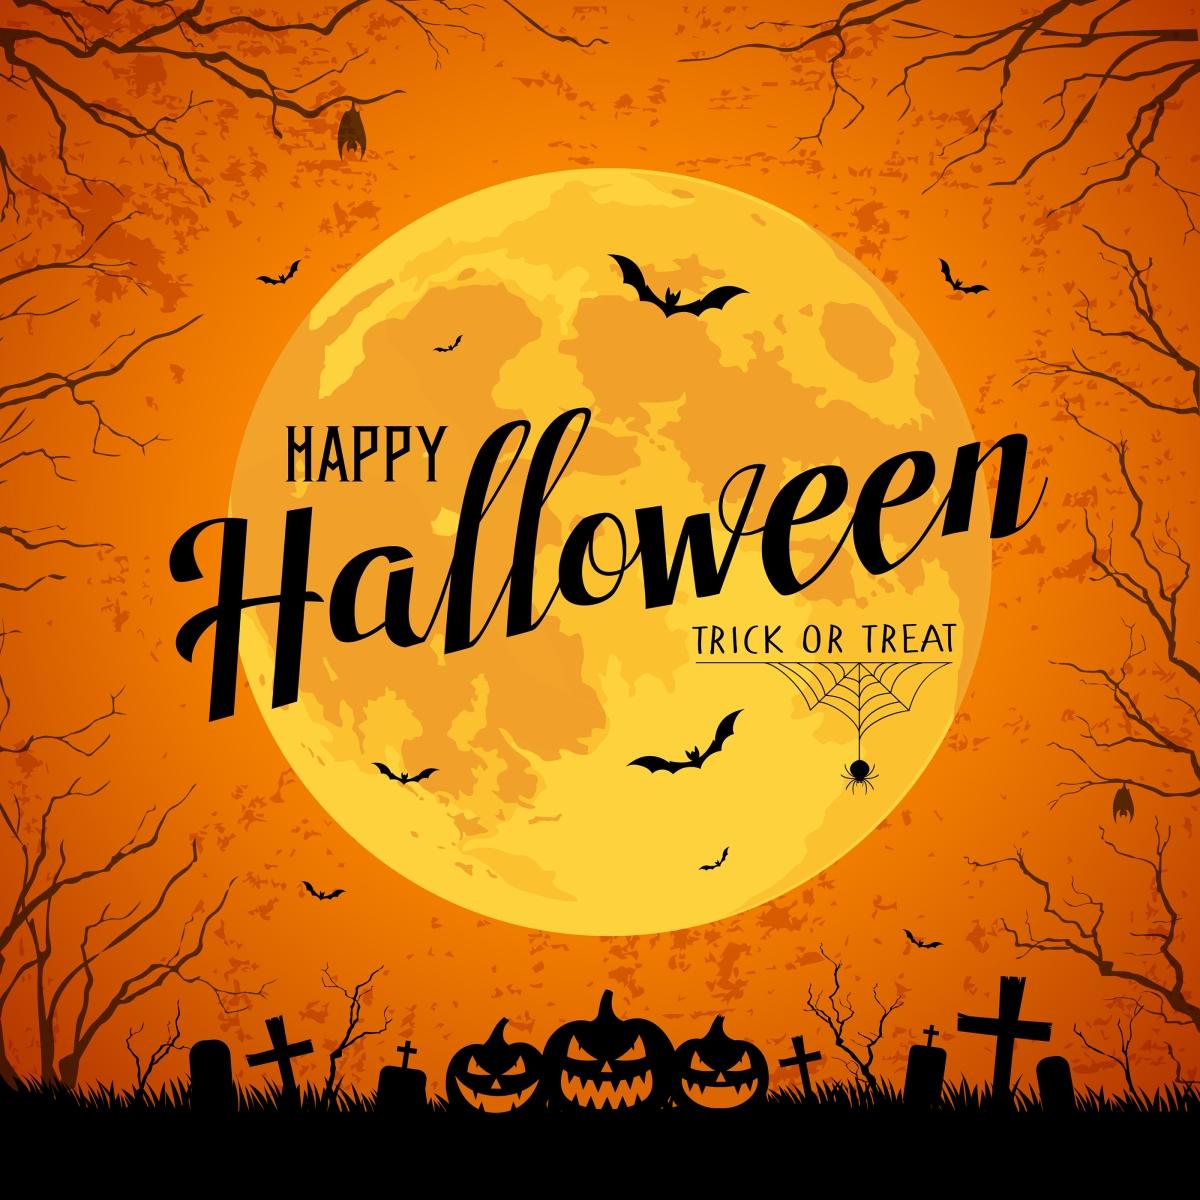 Happy Halloween 2019 Images